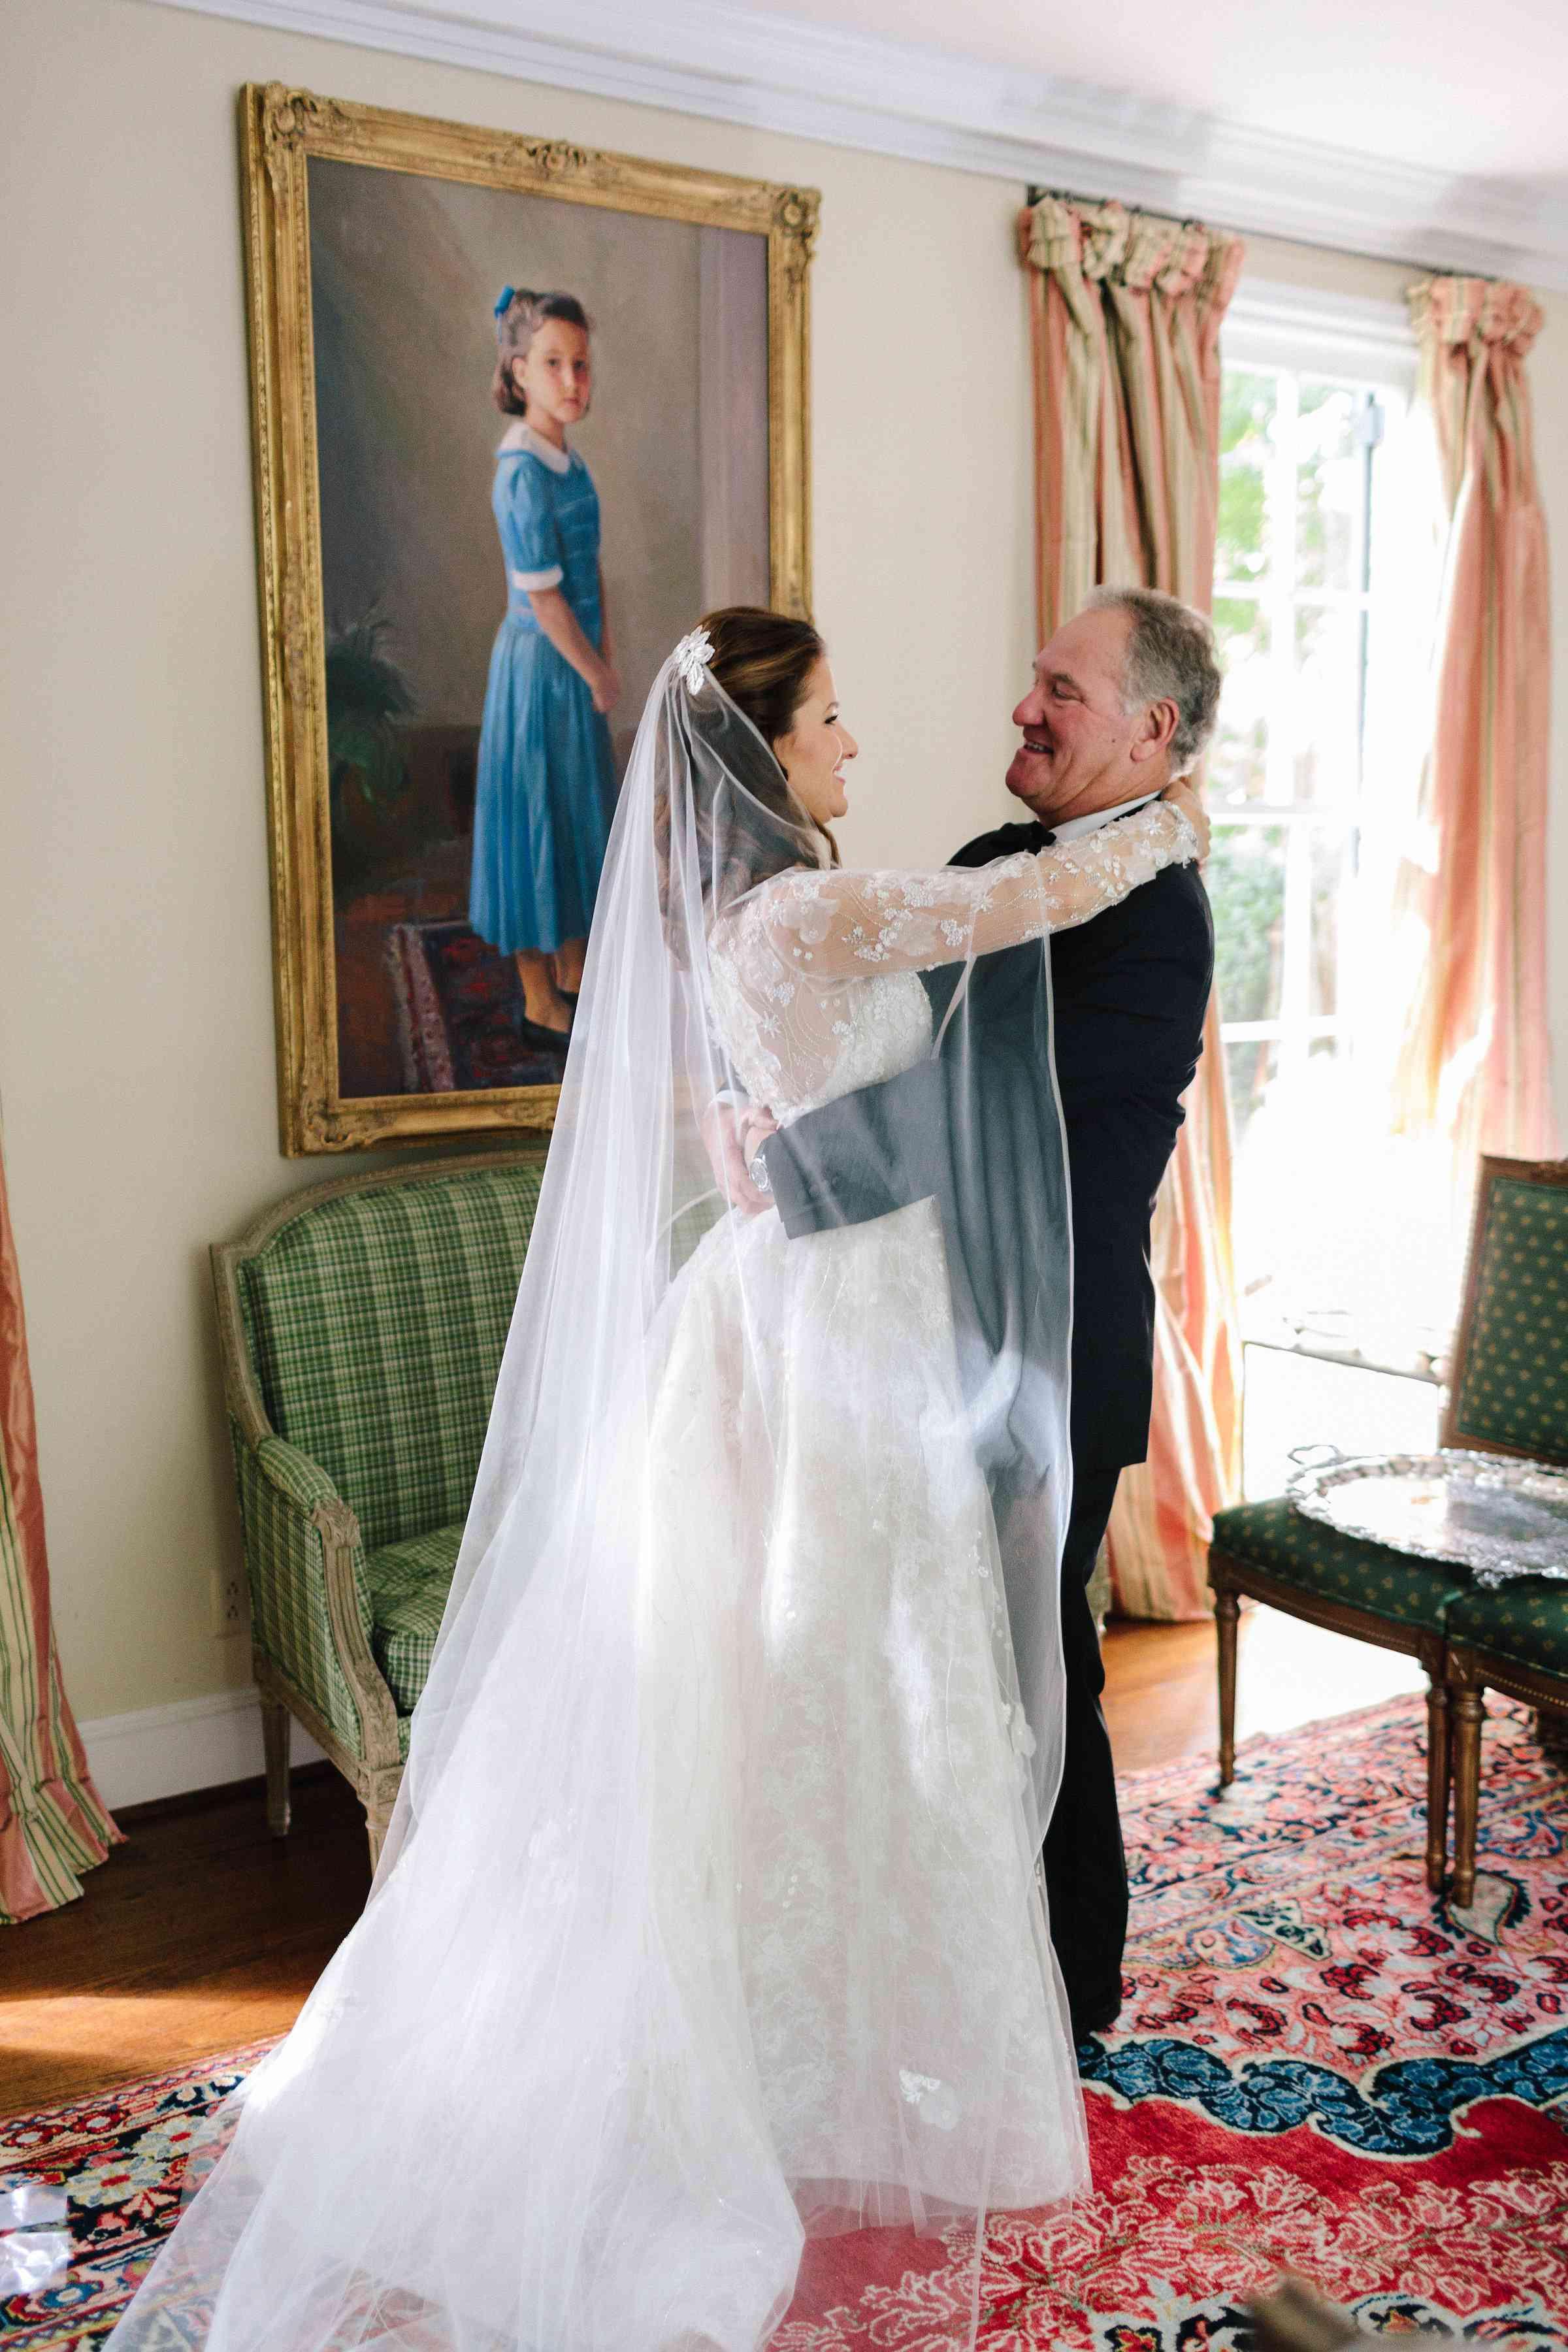 Bride in front of portrait